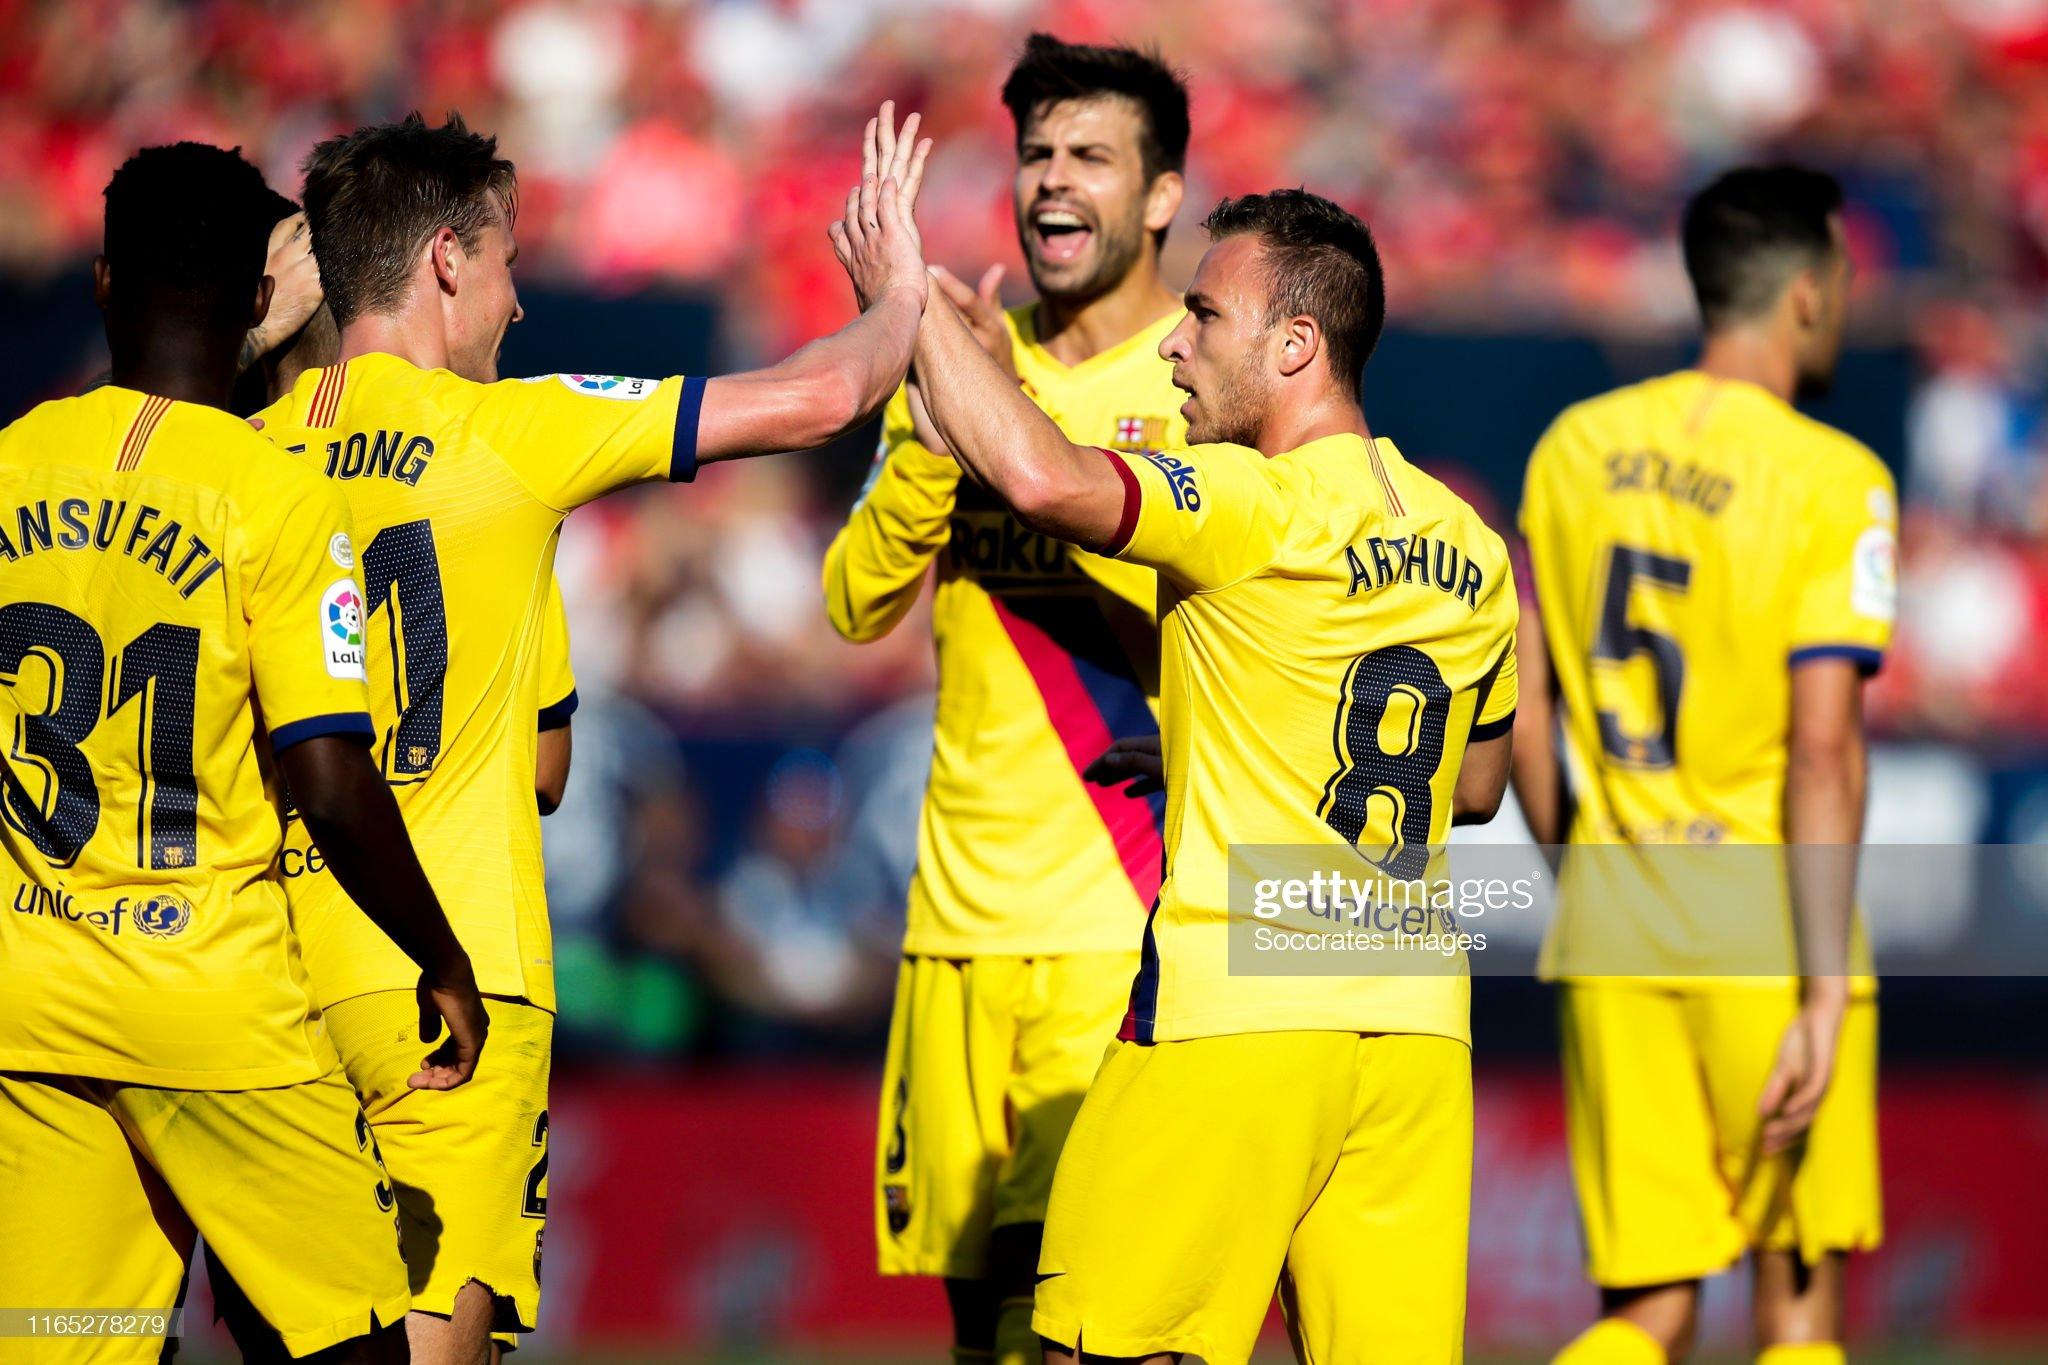 صور مباراة : أوساسونا - برشلونة 2-2 ( 31-08-2019 )  Ansu-fati-of-fc-barcelona-sergio-busquets-of-fc-barcelona-jordi-alba-picture-id1165278279?s=2048x2048